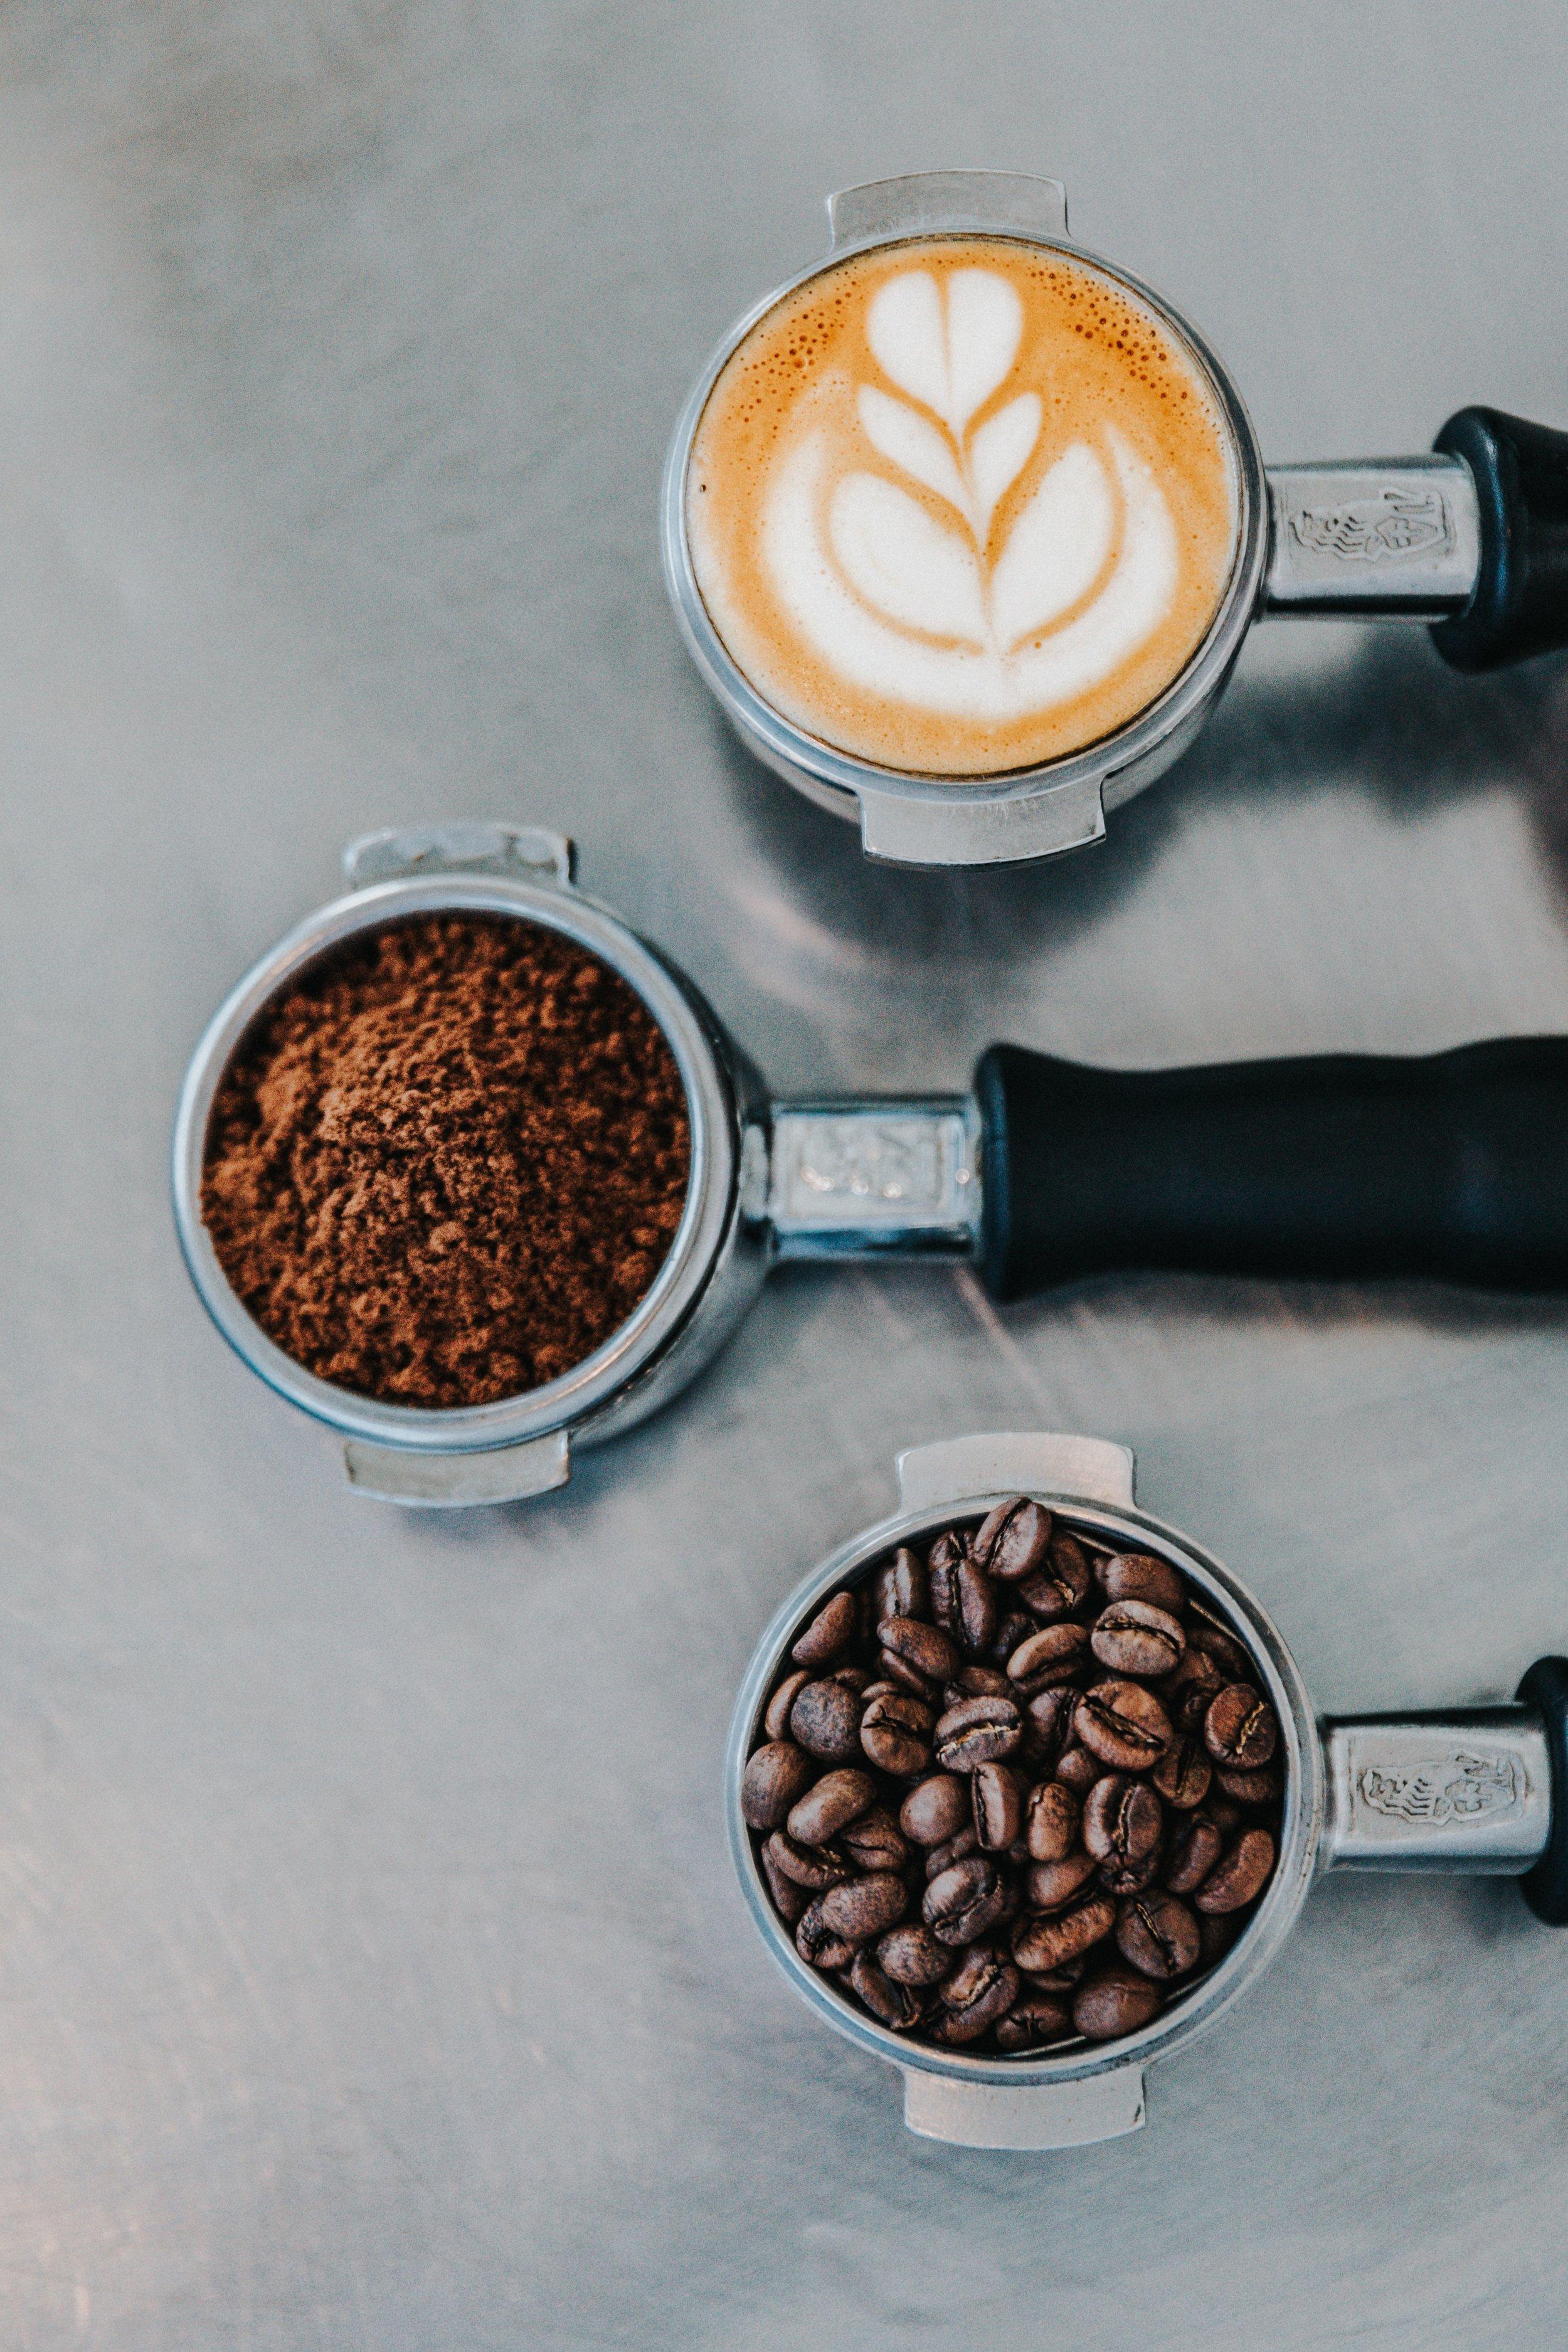 180720 COFFEE.jpg